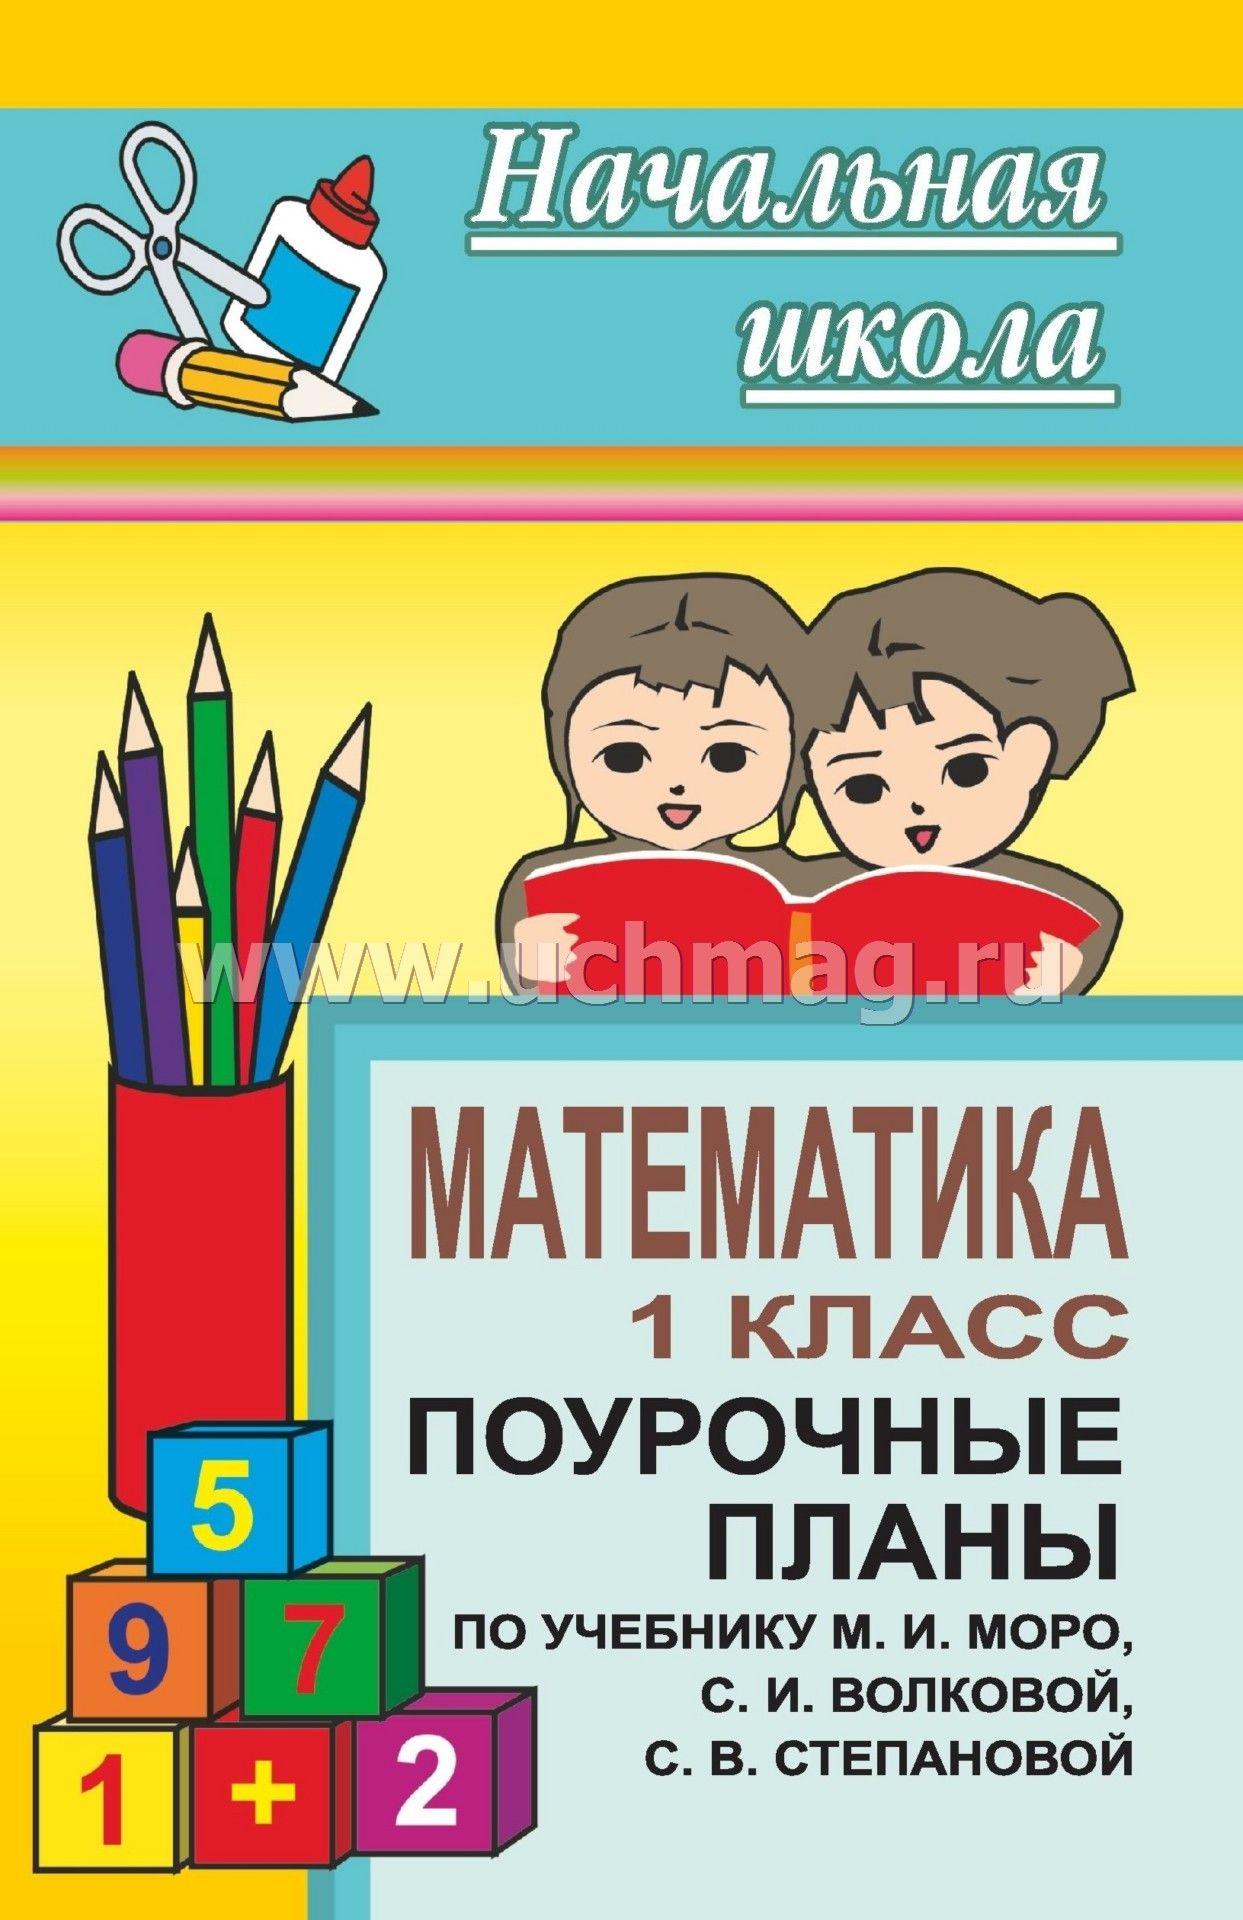 Школьная программа 1 класс